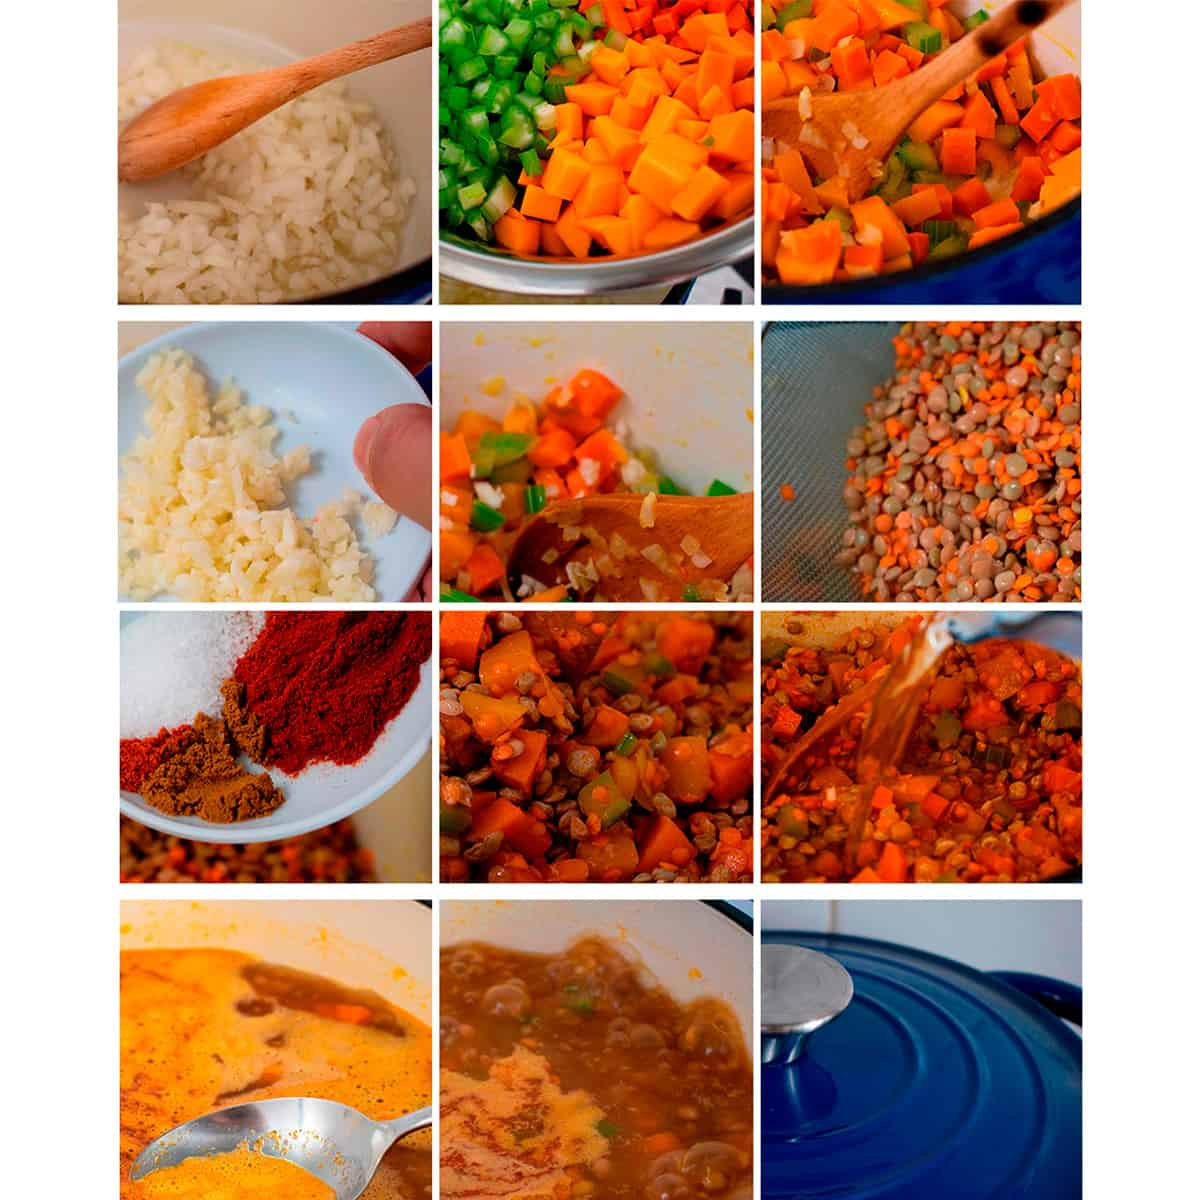 receta paso a paso para preparar sopa de lentejas casera